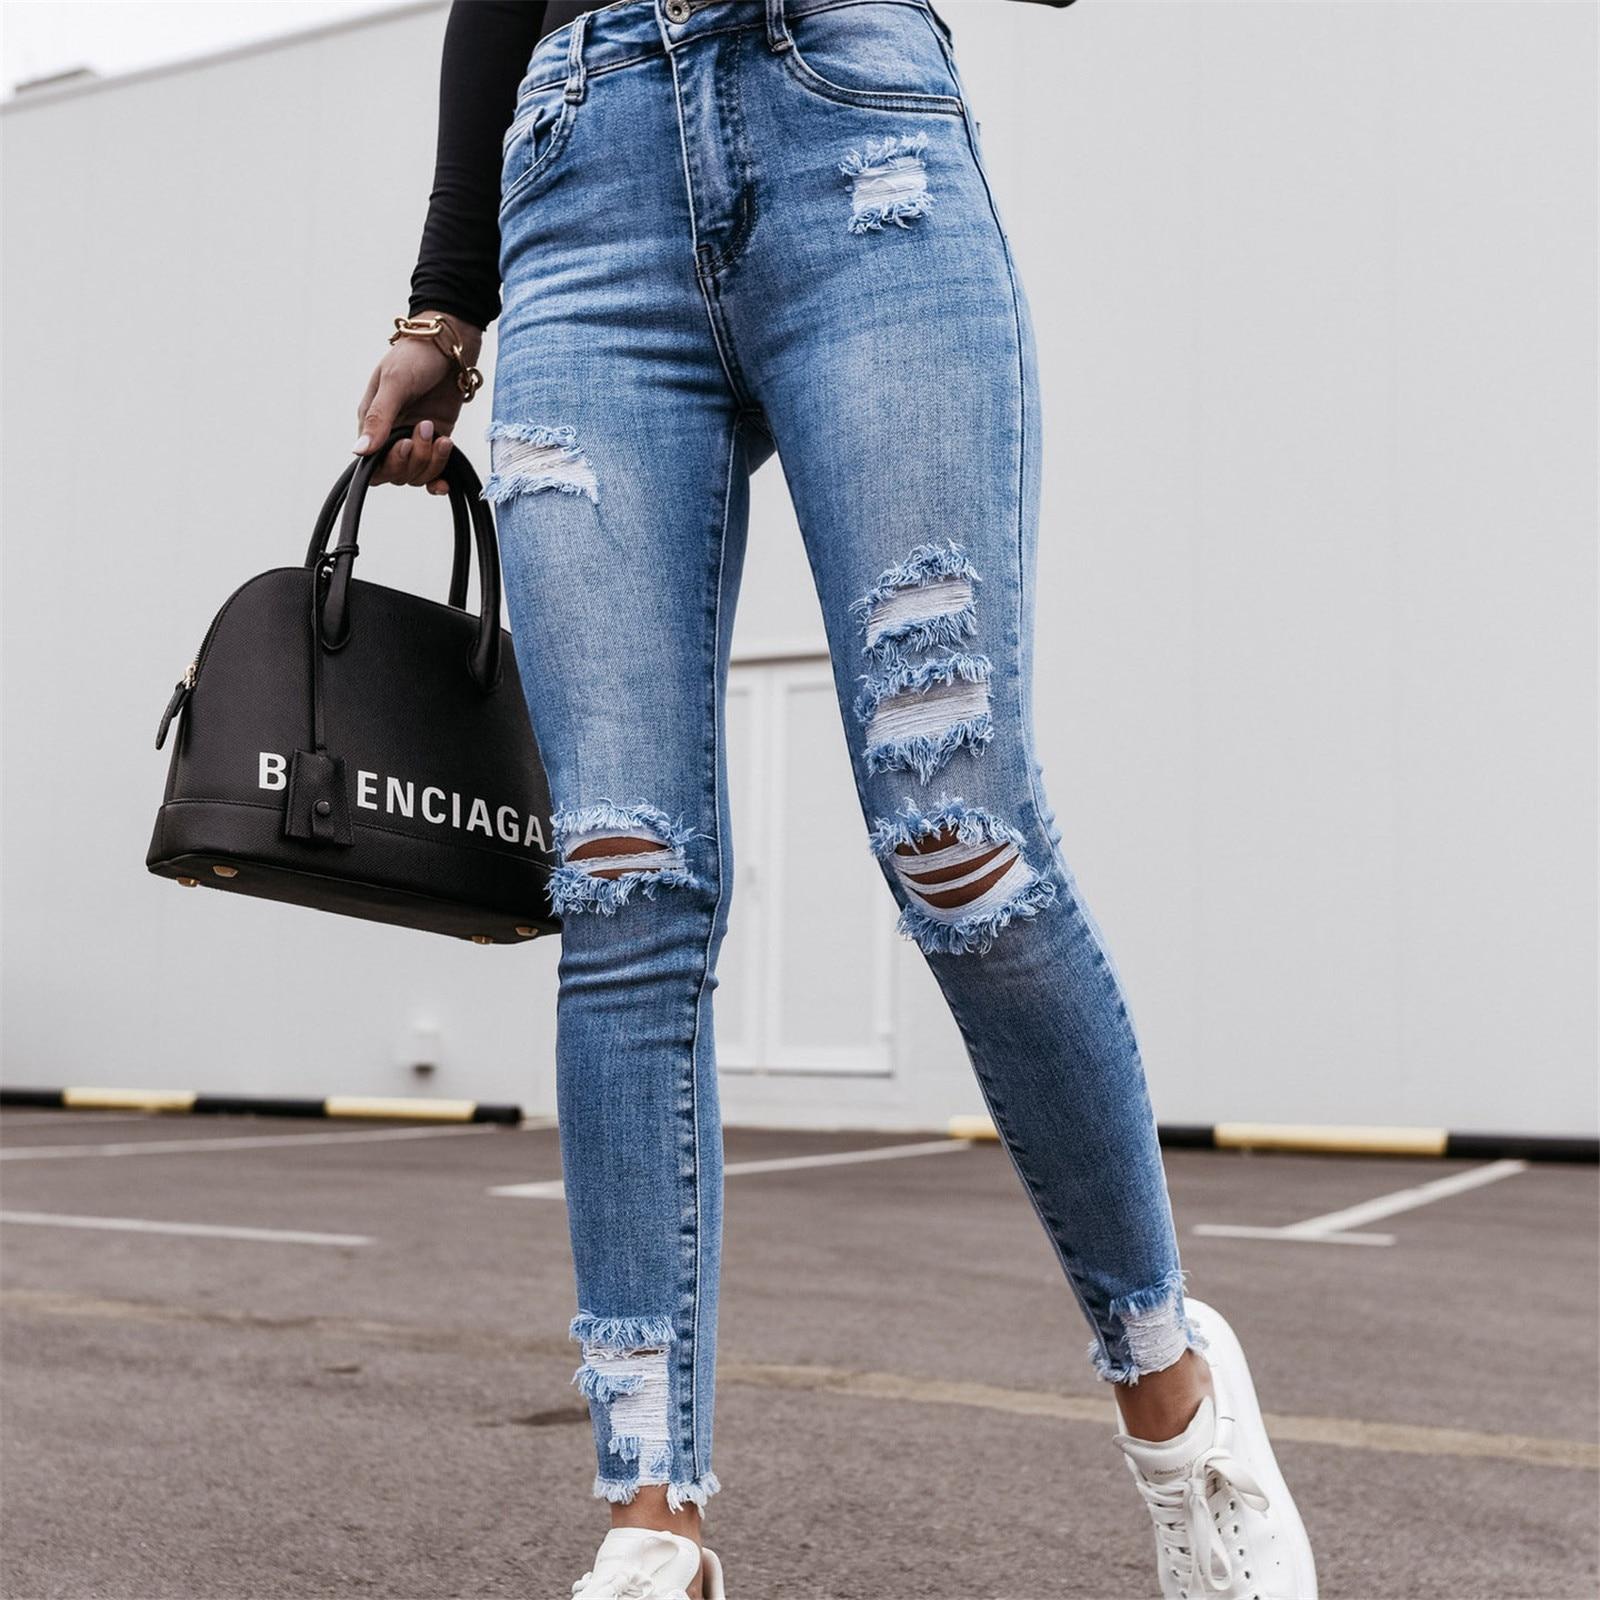 Fashion Vintage Ripped Gat Potlead Long Broek Solid jeans Women Lent Summer Casual High Tail Slank Denim Broek